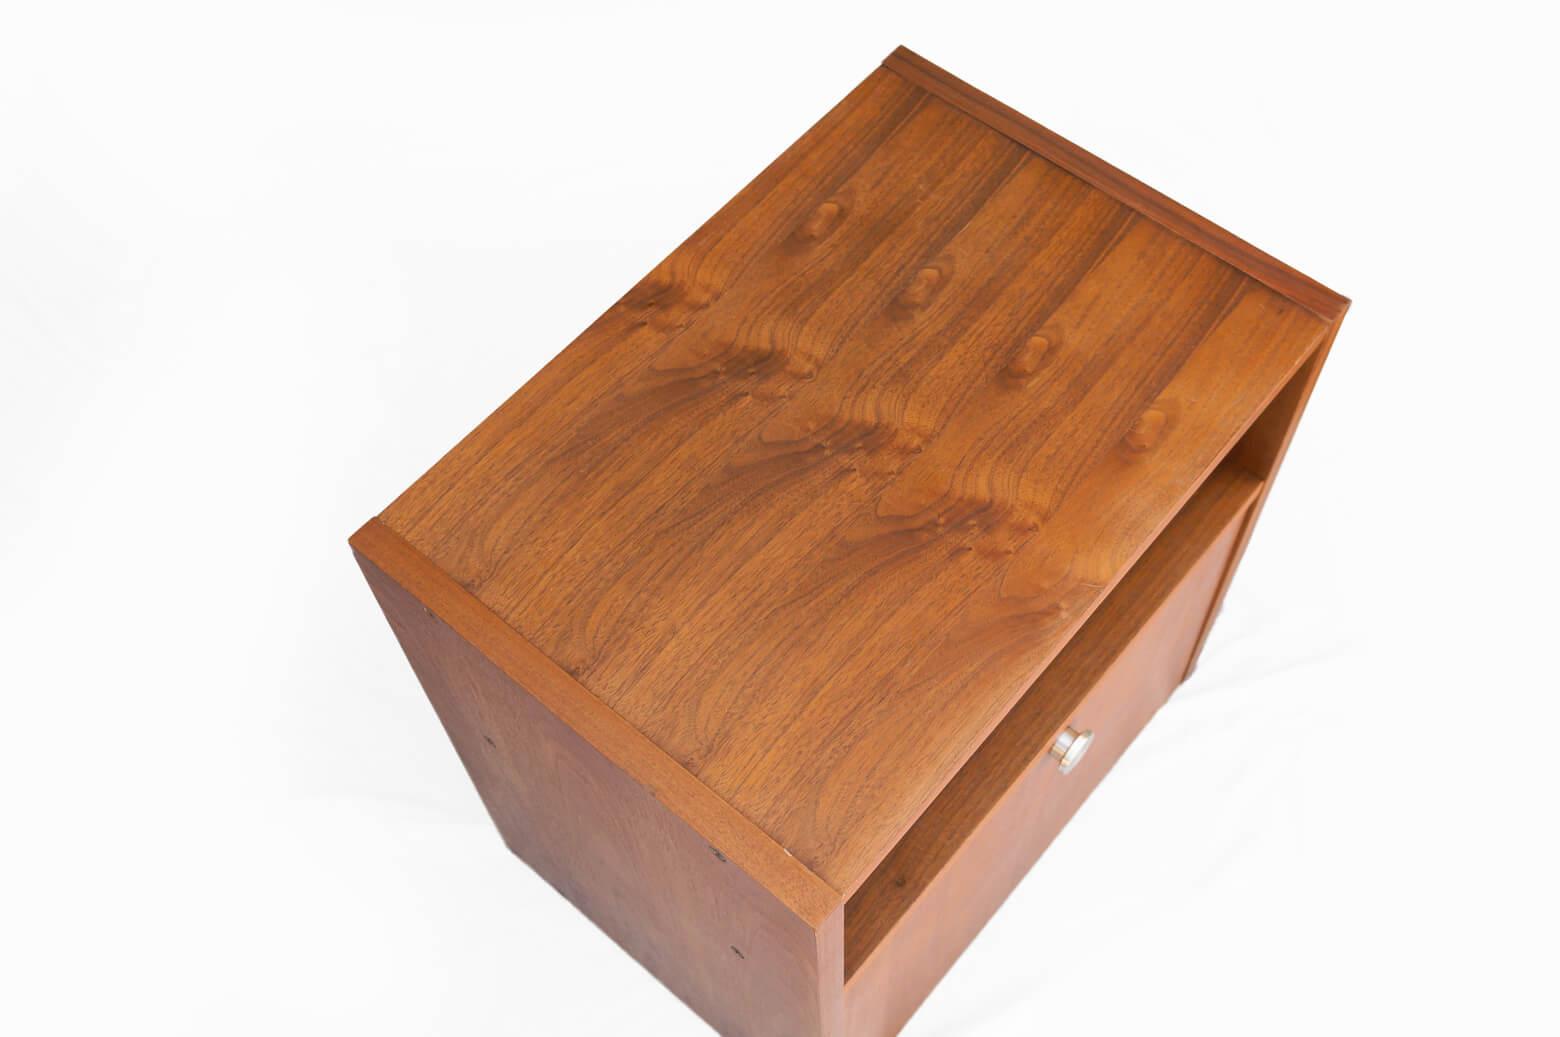 Pioneer Audio Rack/パイオニア オーディオラック ヴィンテージ チーク材 棚 レトロ